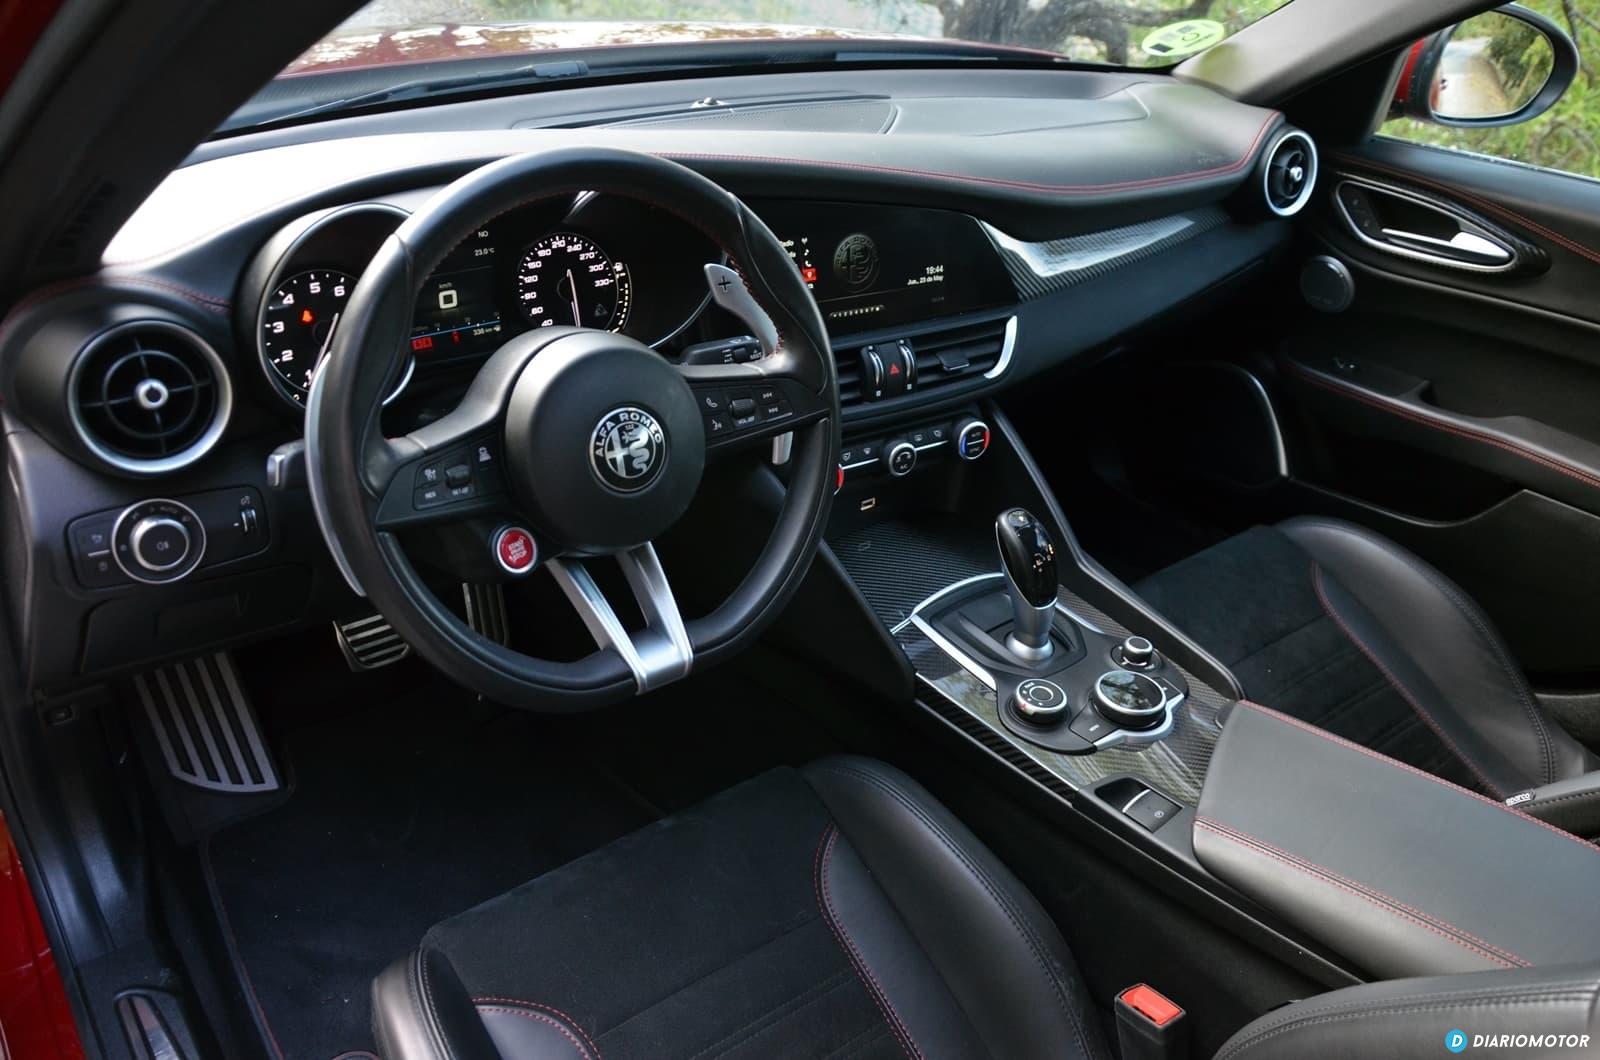 Tesla Model 3 Vs Alfa Romeo Giulia Quadrifoglio 0619 007